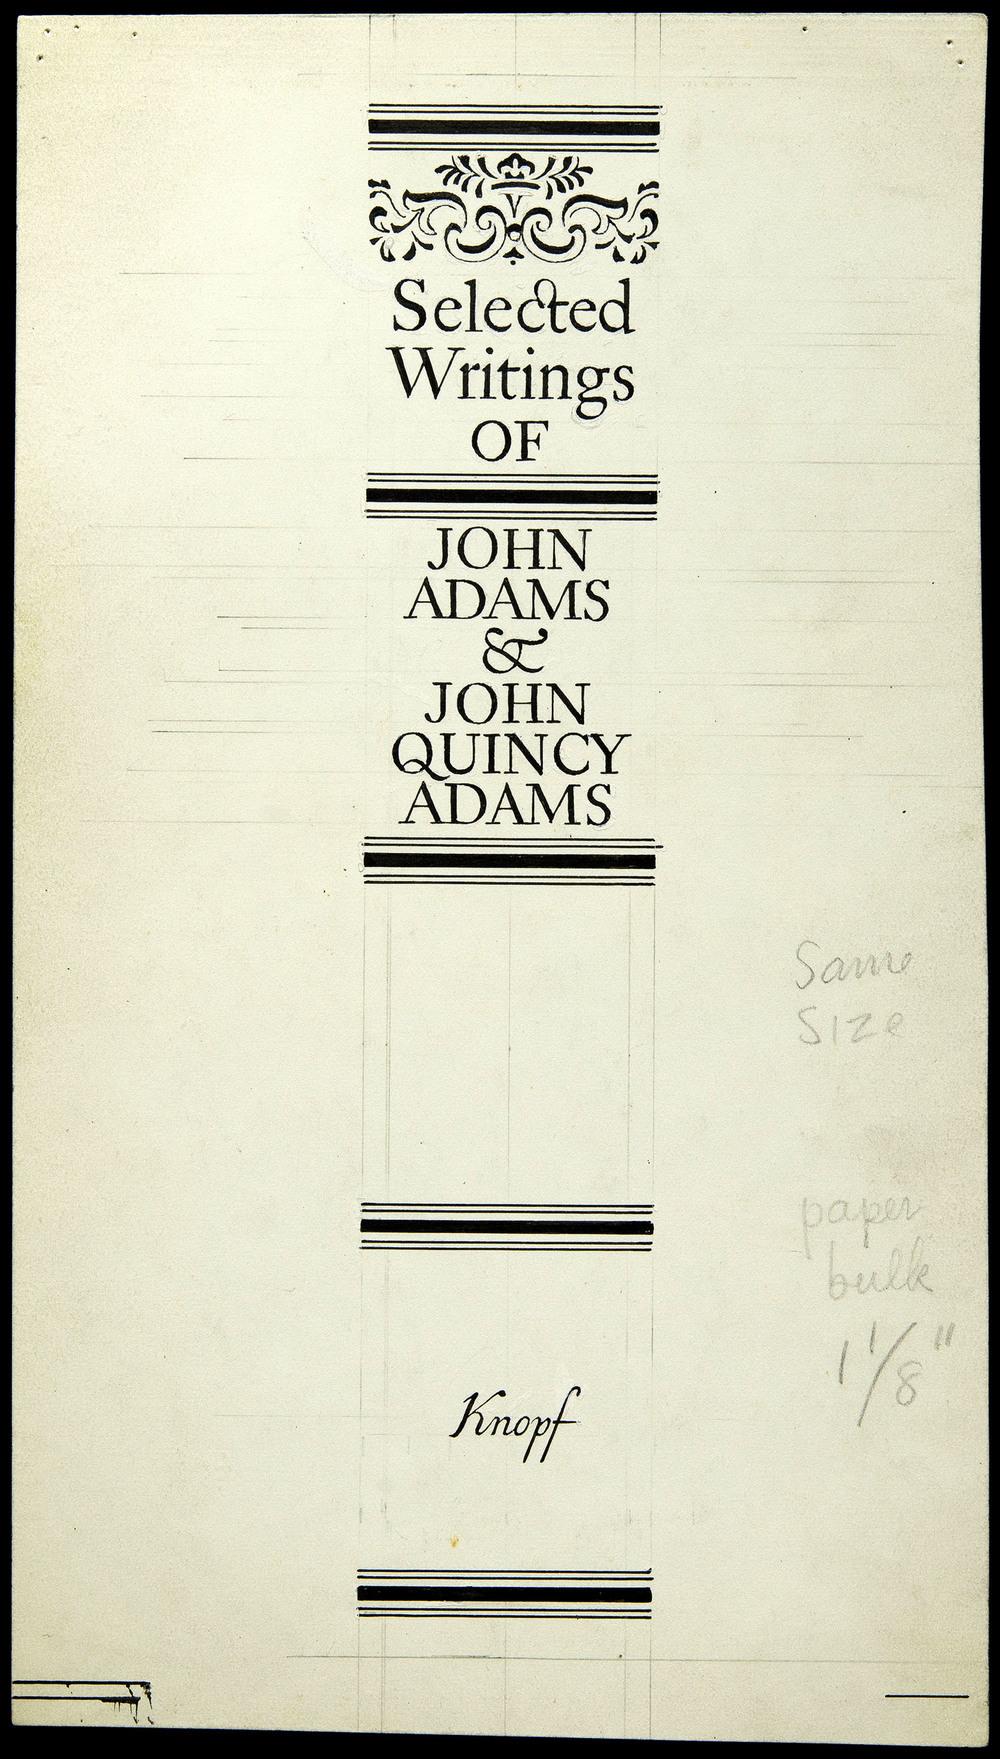 Original art for shelf back,  Selected Writings of John Adams , Knopf, New York, 1946, 13.5 x 24 cm